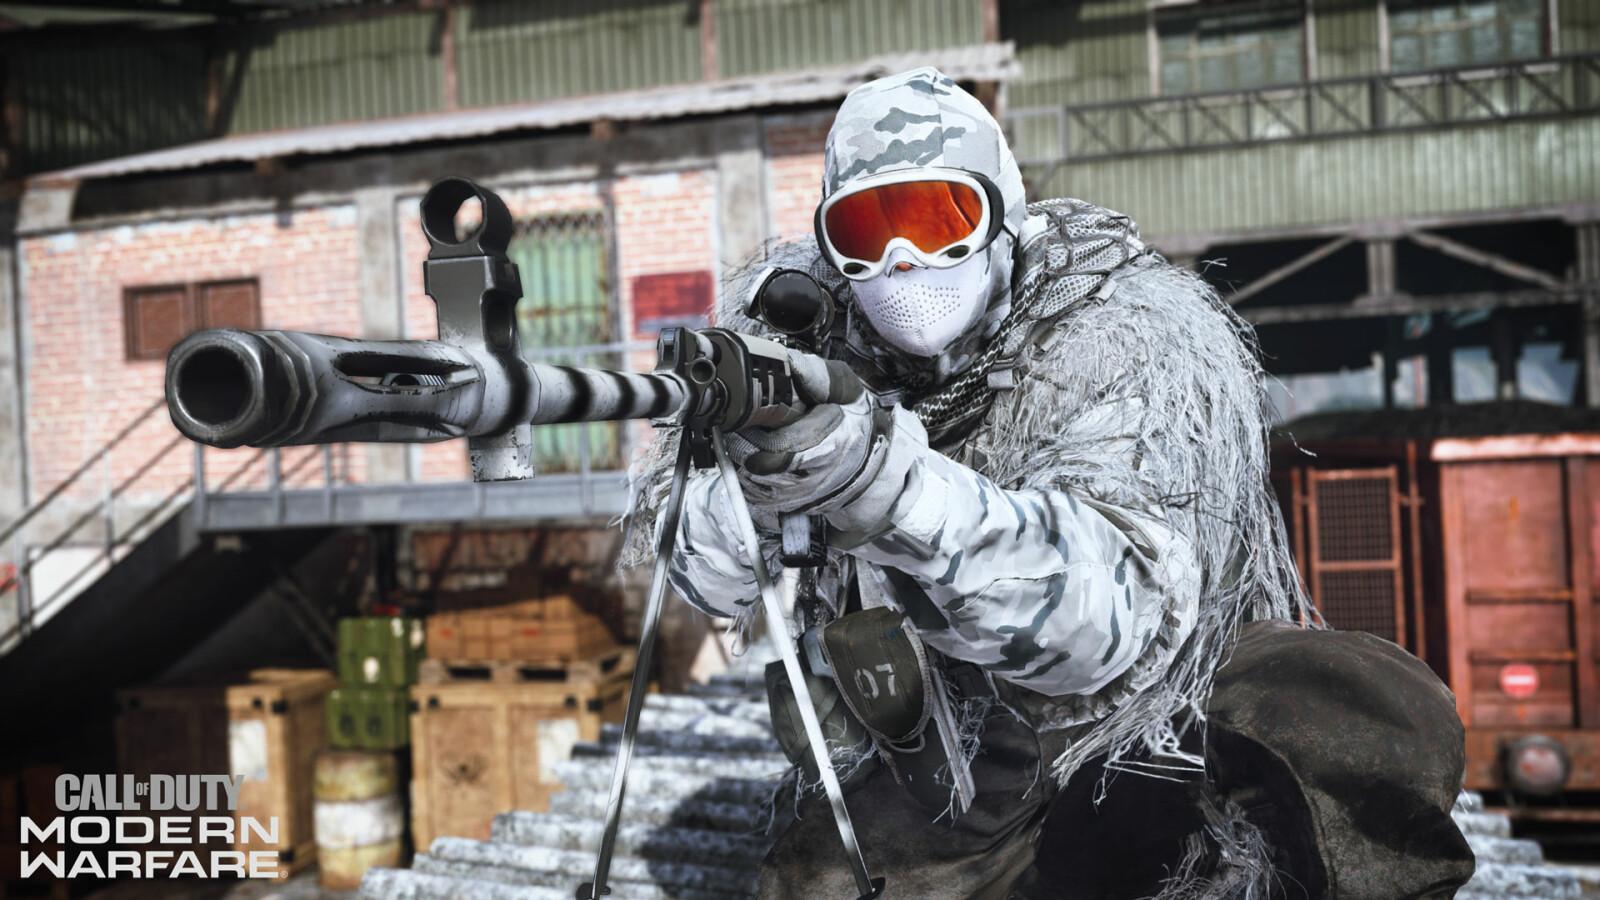 Call of Duty Modern Warfare: Battle Royale-Modus Warzone wohl mit großer Überraschung